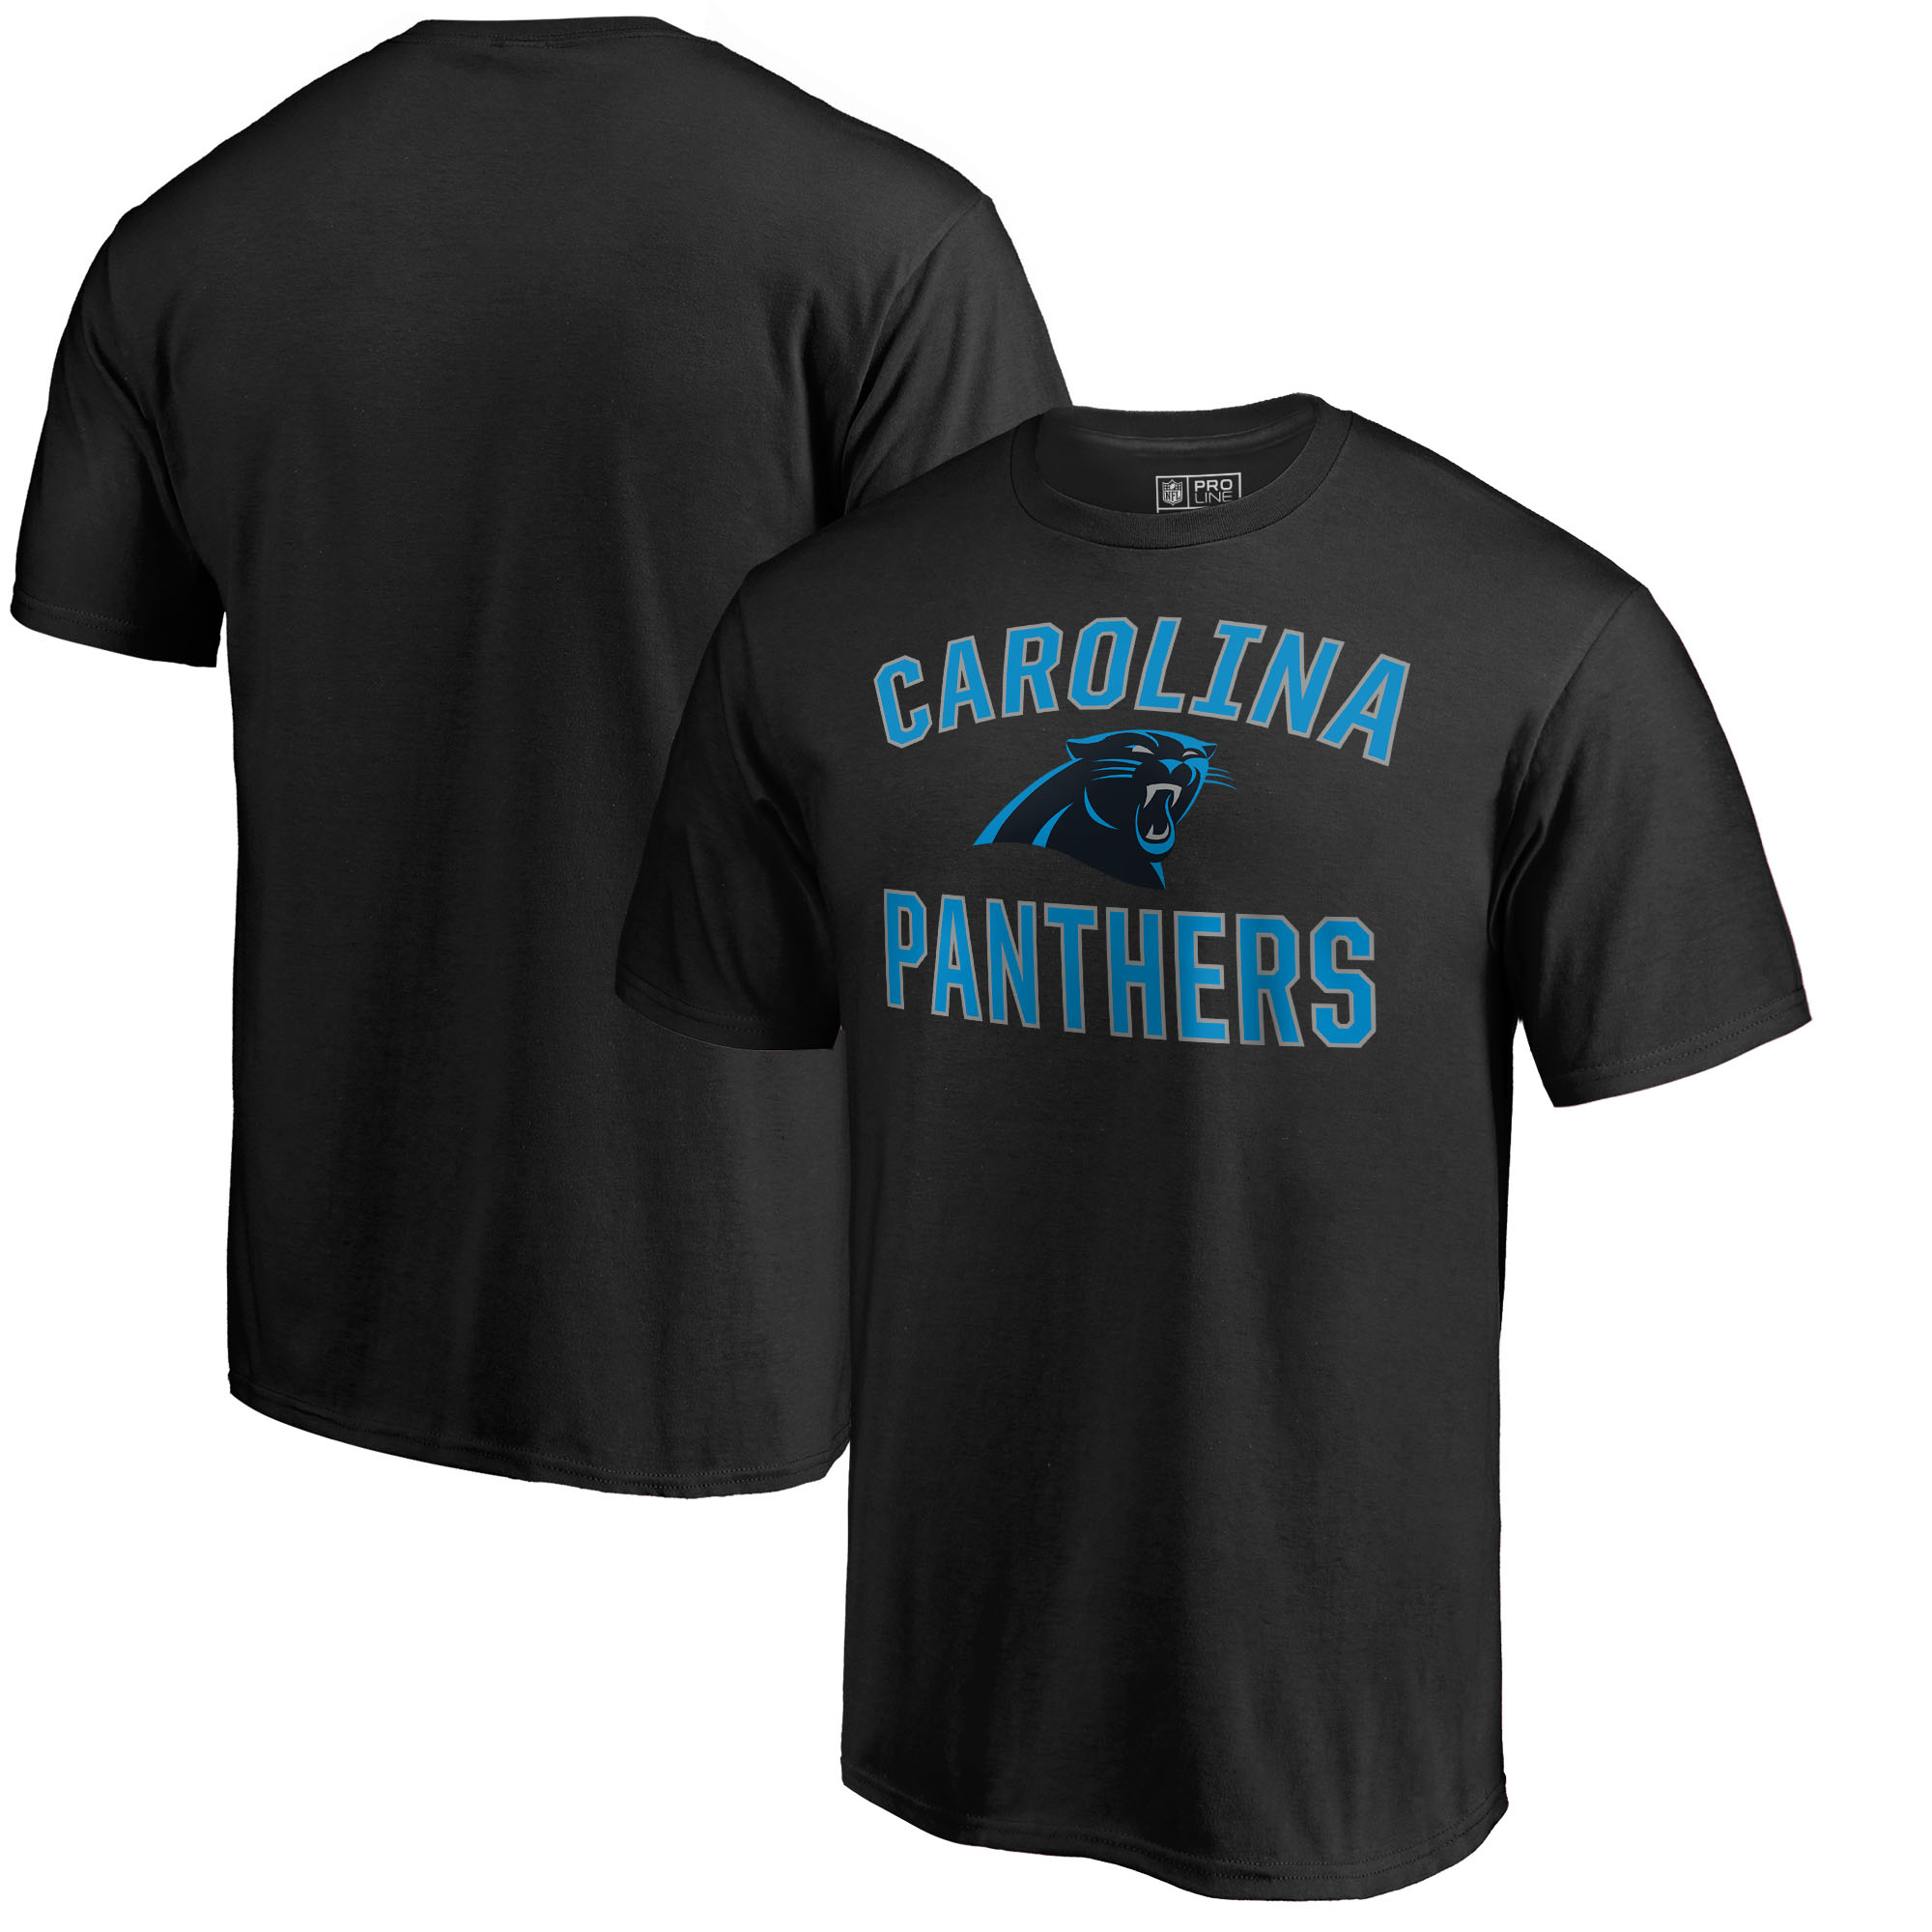 Carolina Panthers NFL Pro Line by Fanatics Branded Victory Arch T-Shirt - Black